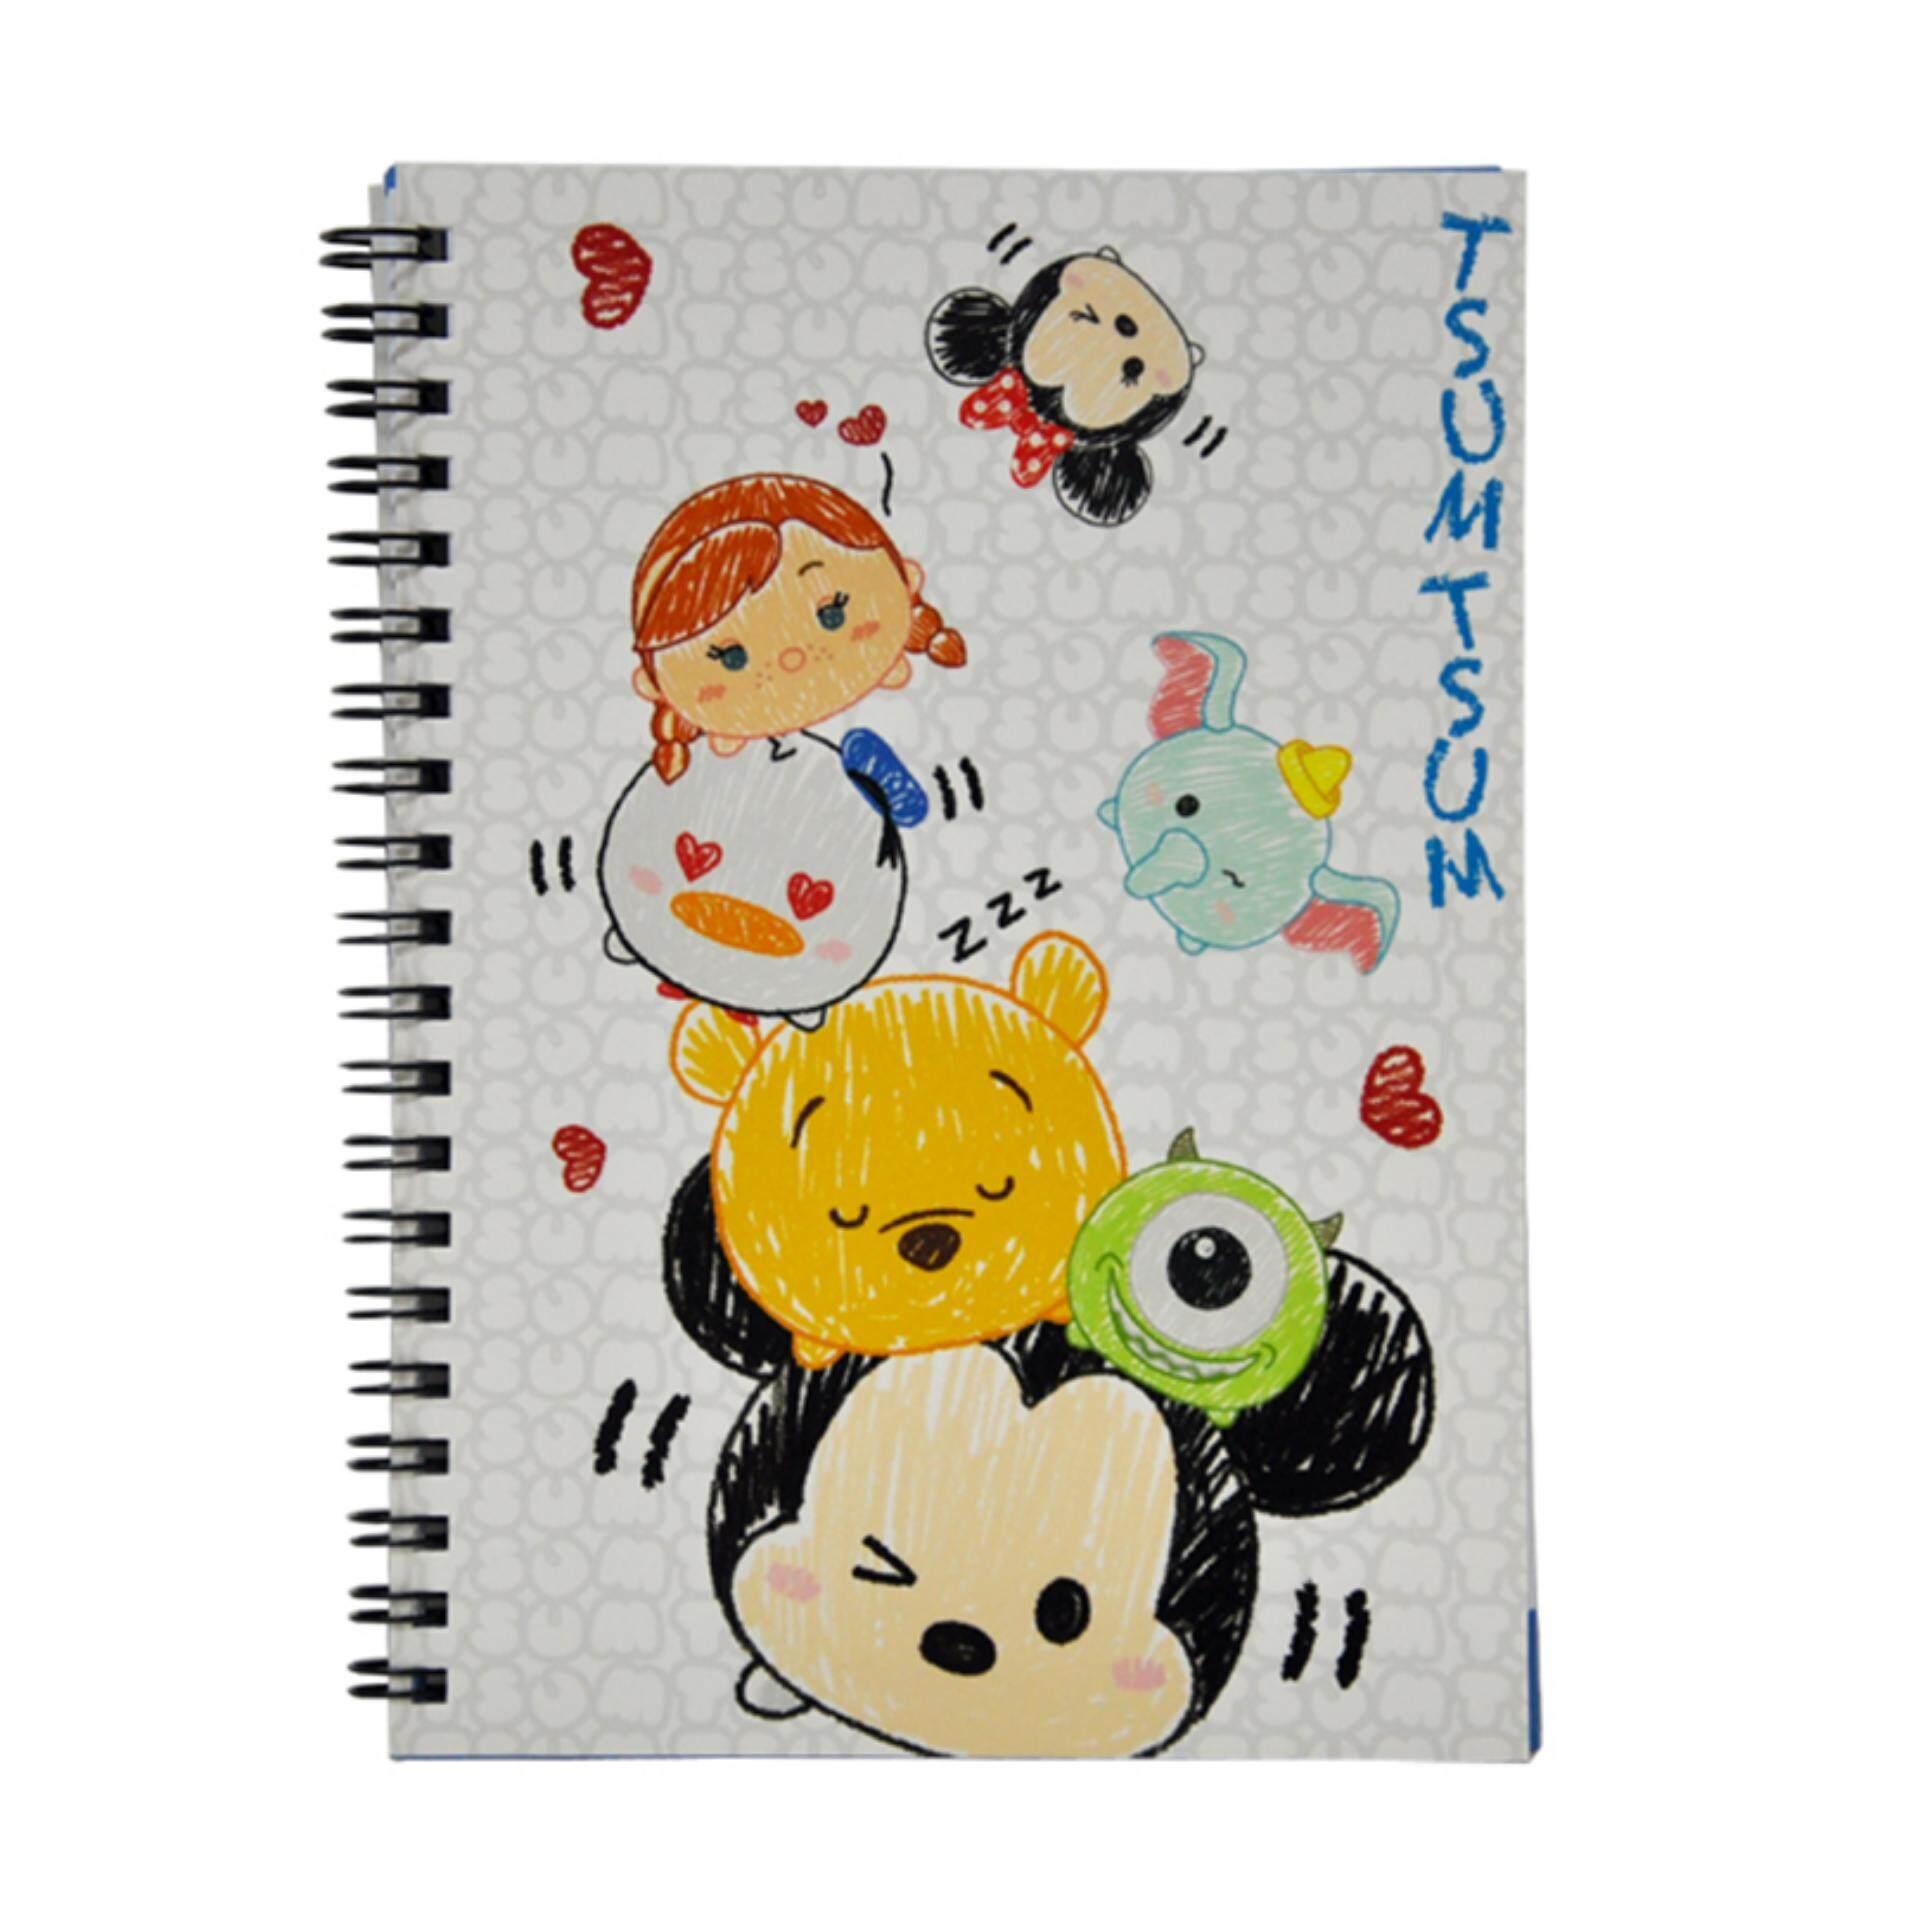 Disney Tsum Tsum NoteBook - Sketch